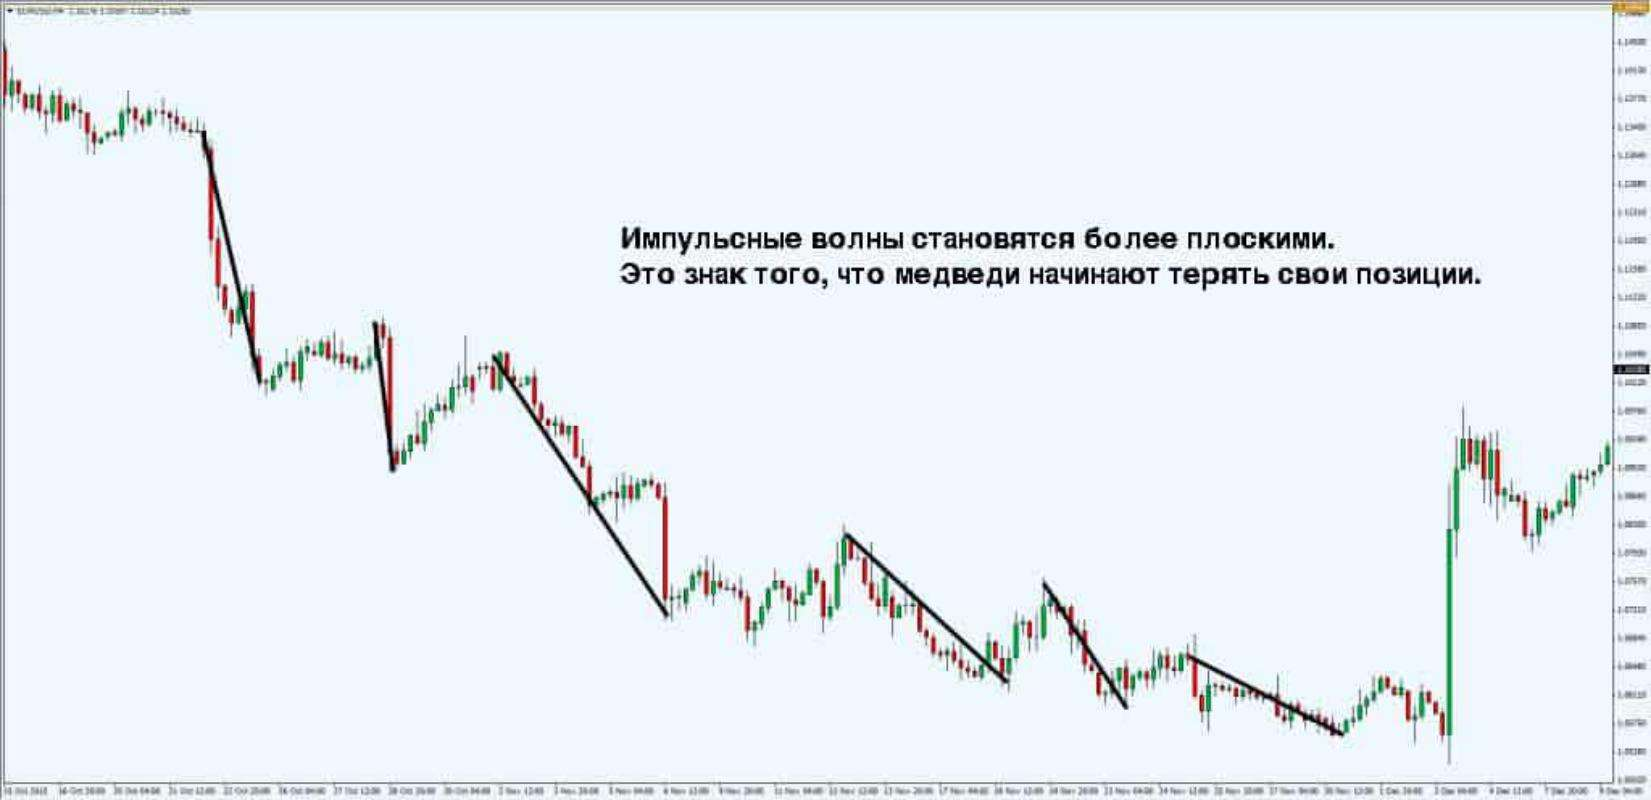 Price Action индикатор, стратегия торговли